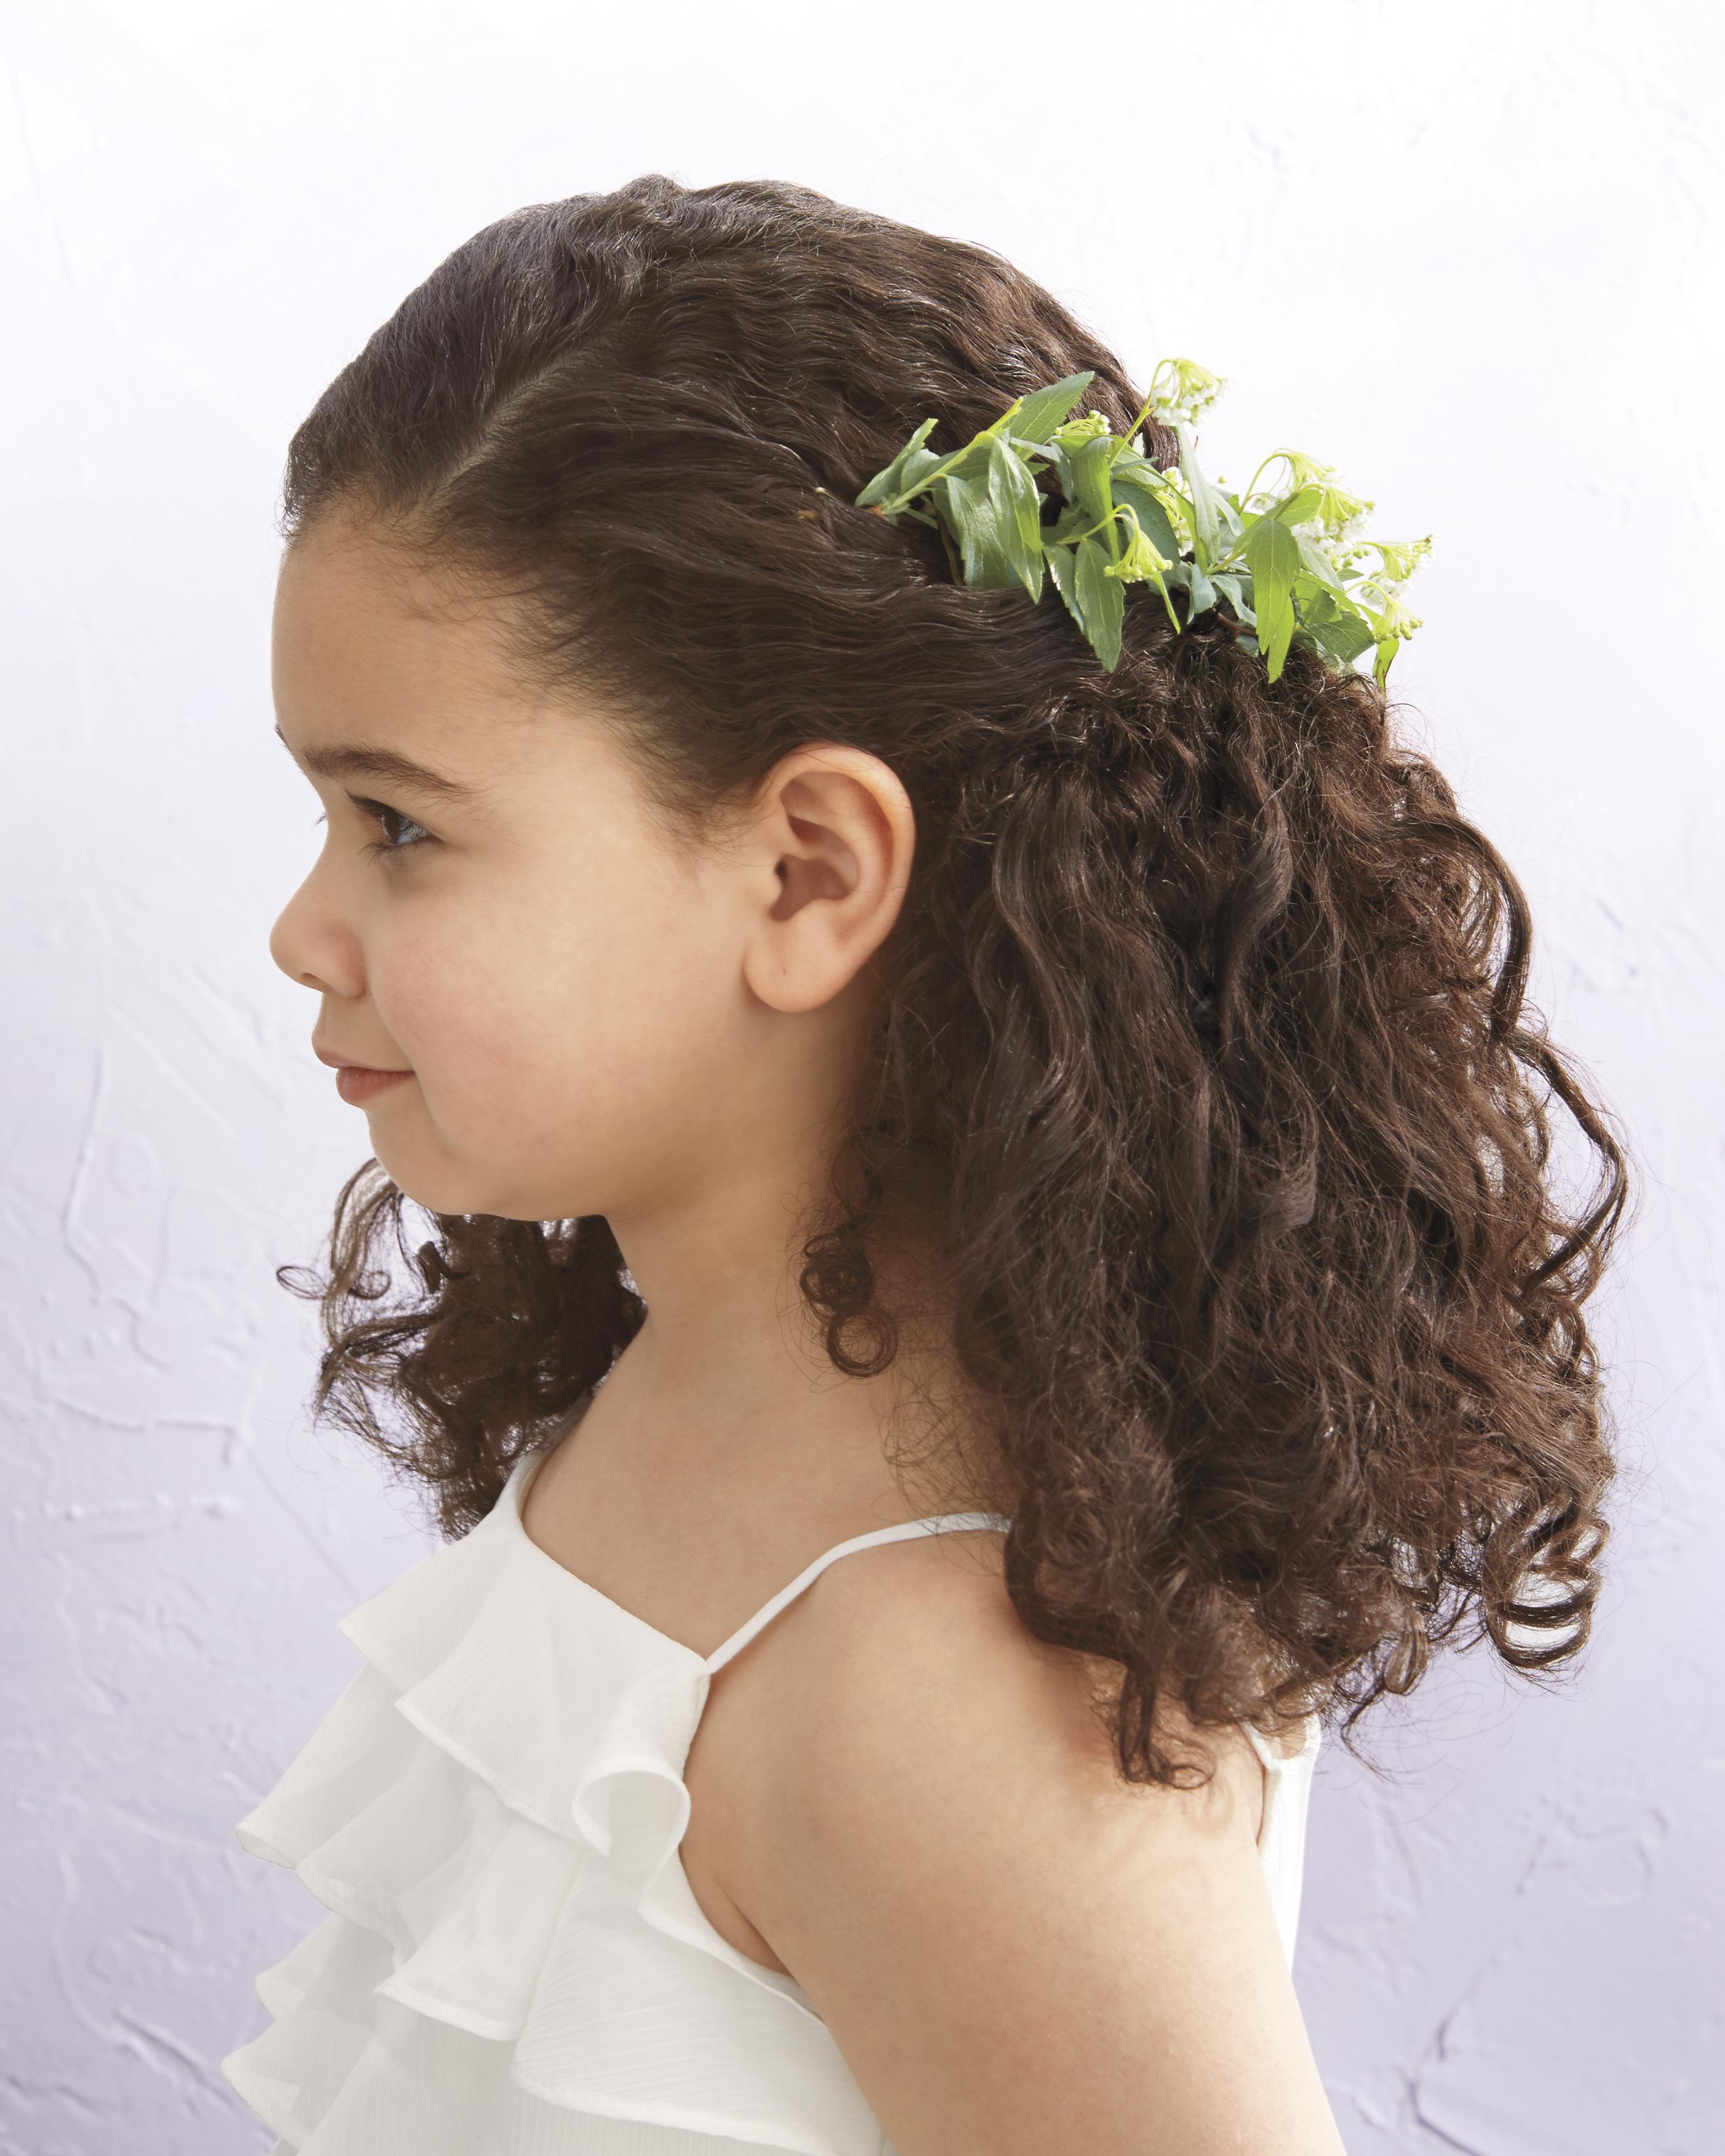 Flower Girl's Single Twist Sideswept Hairstyle